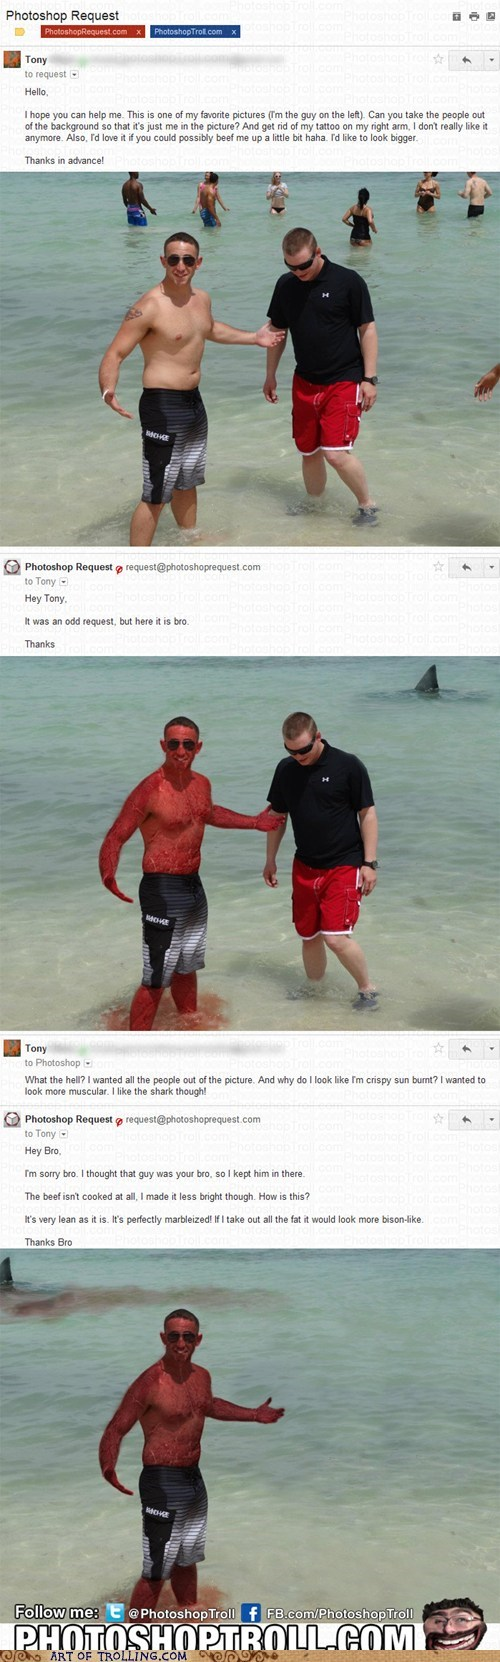 beach Beef photoshop - 6356999680